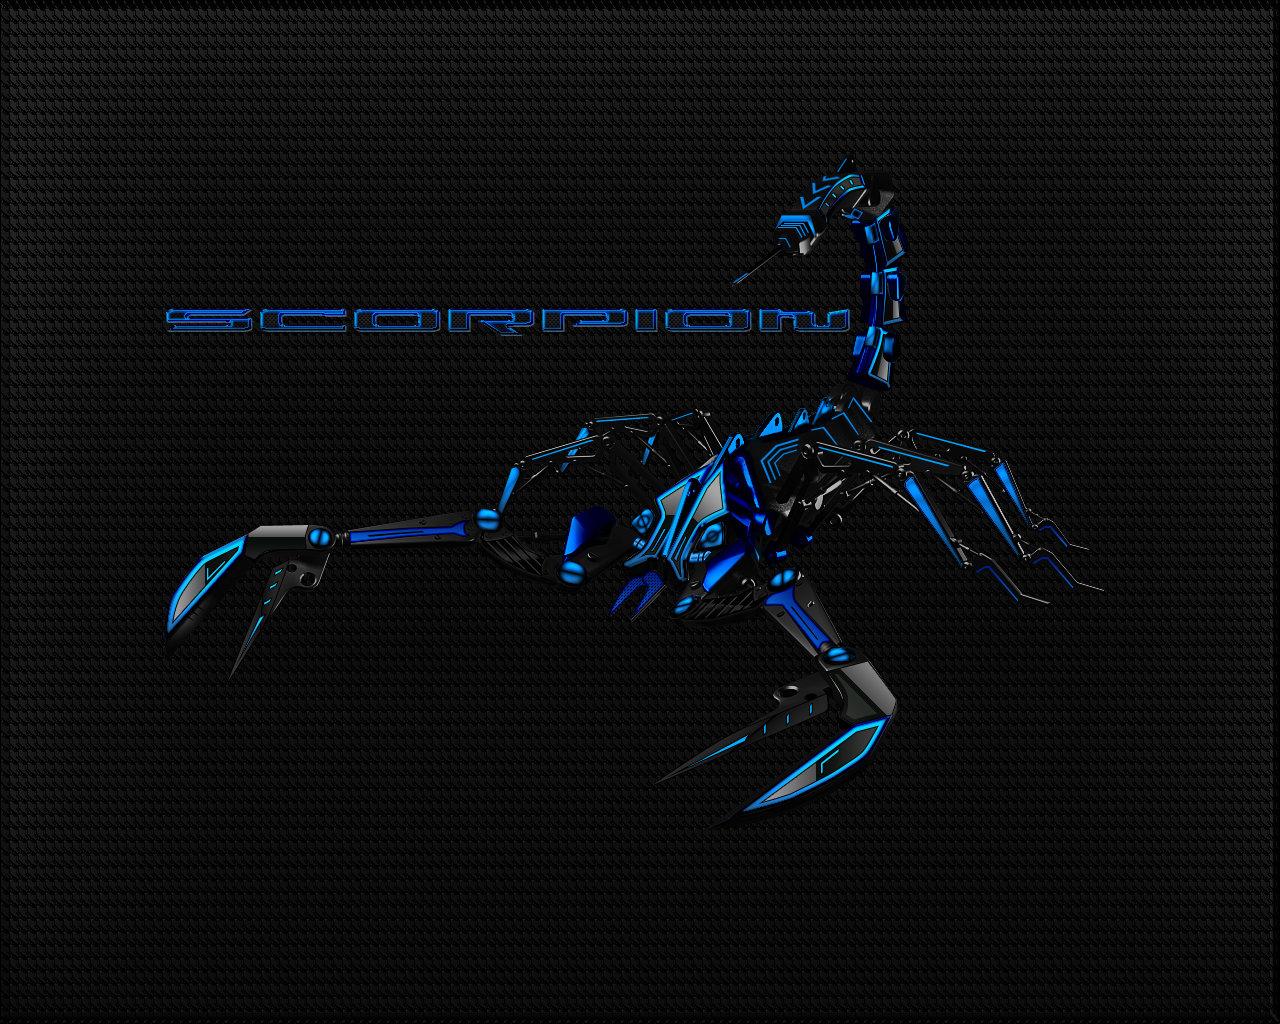 Black Blue Scorpion Wallpaper by Micro31337 on deviantART 1280x1024